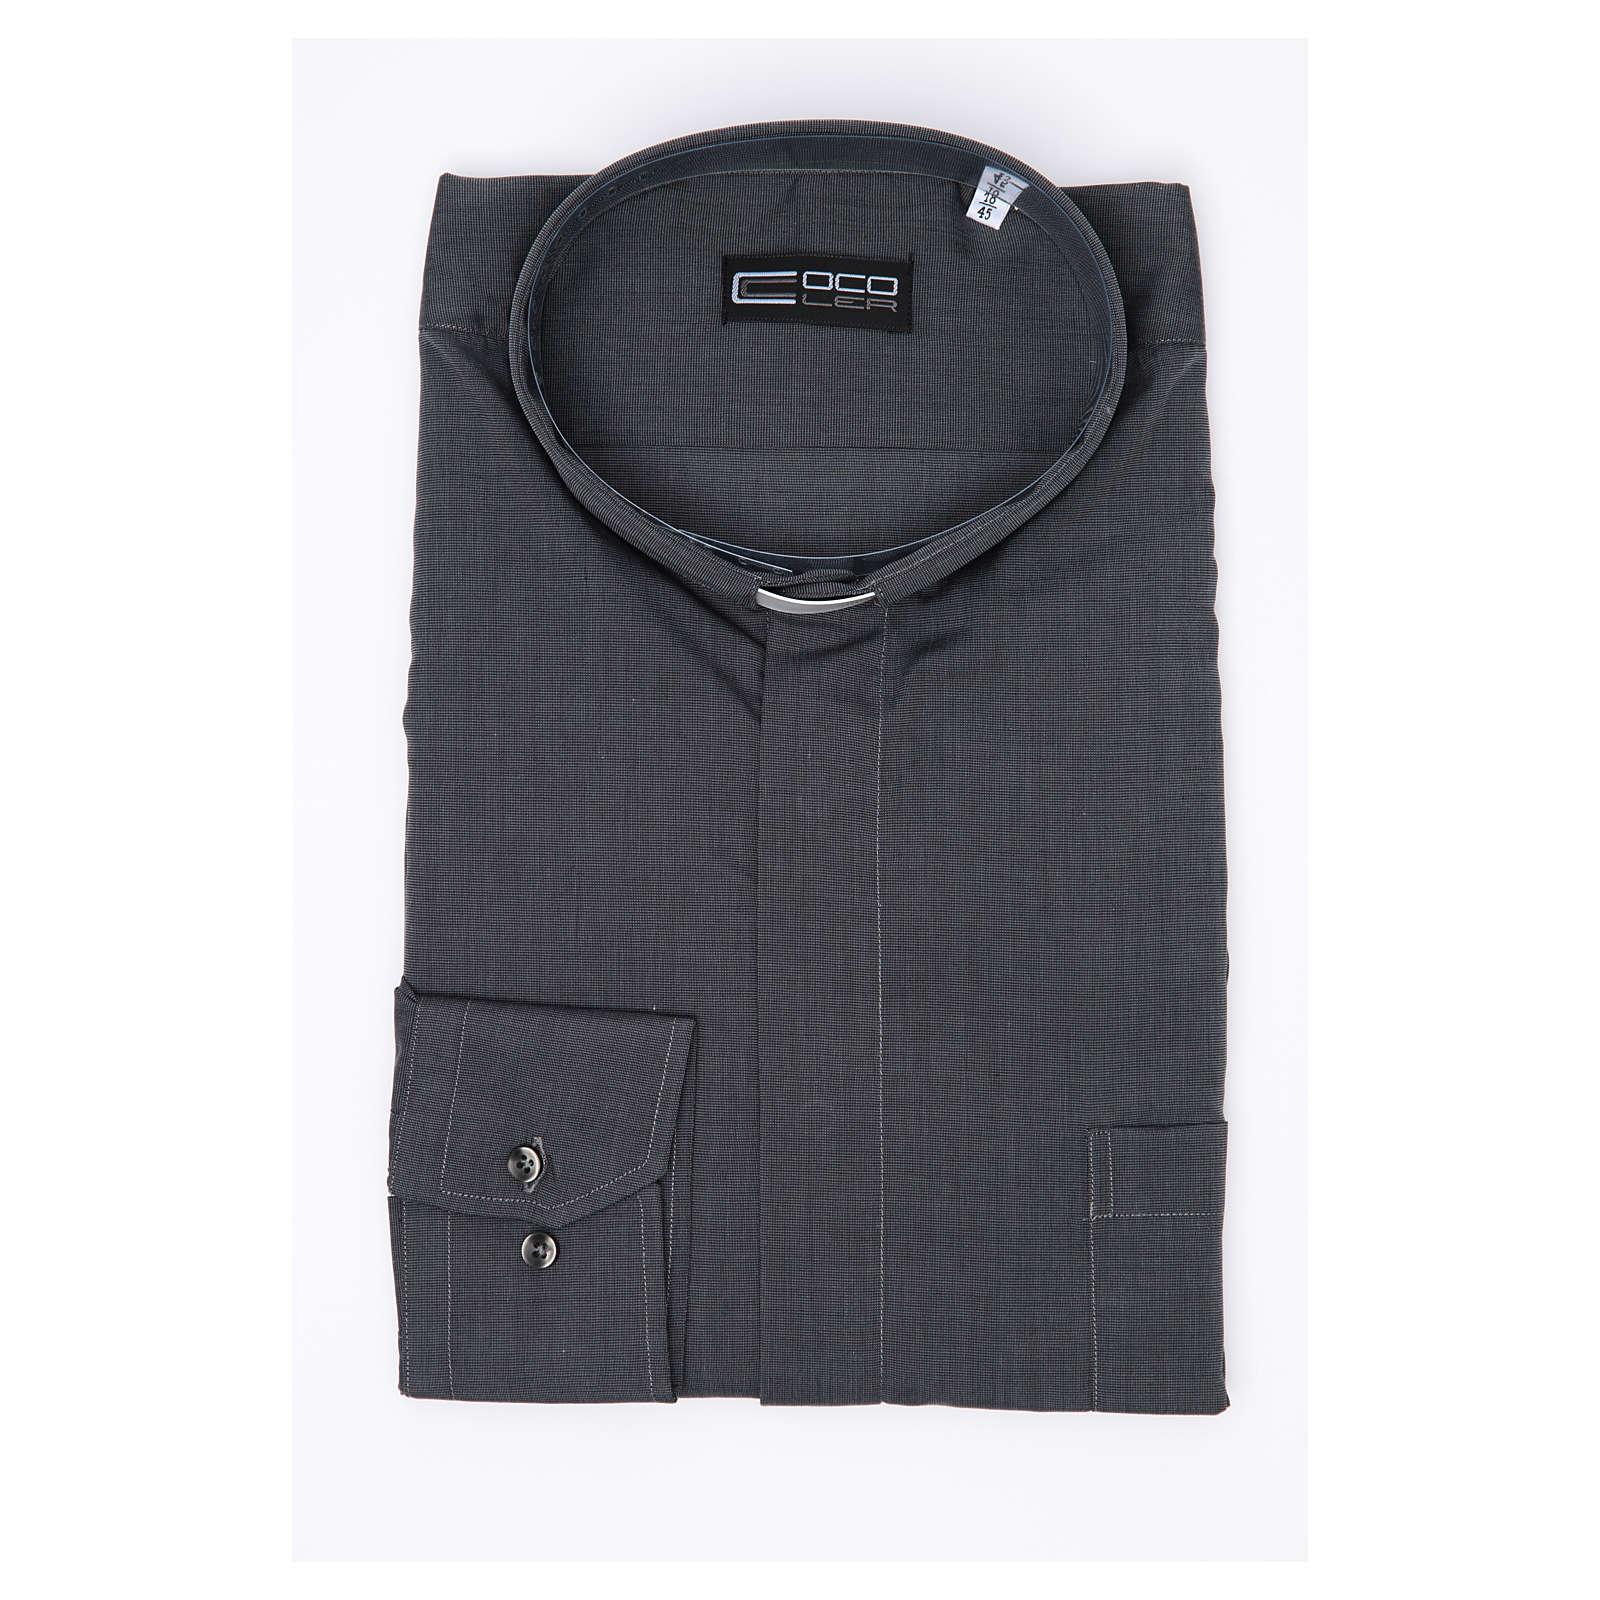 Camisa clergy M/L filafil misto algodão cinzento 4